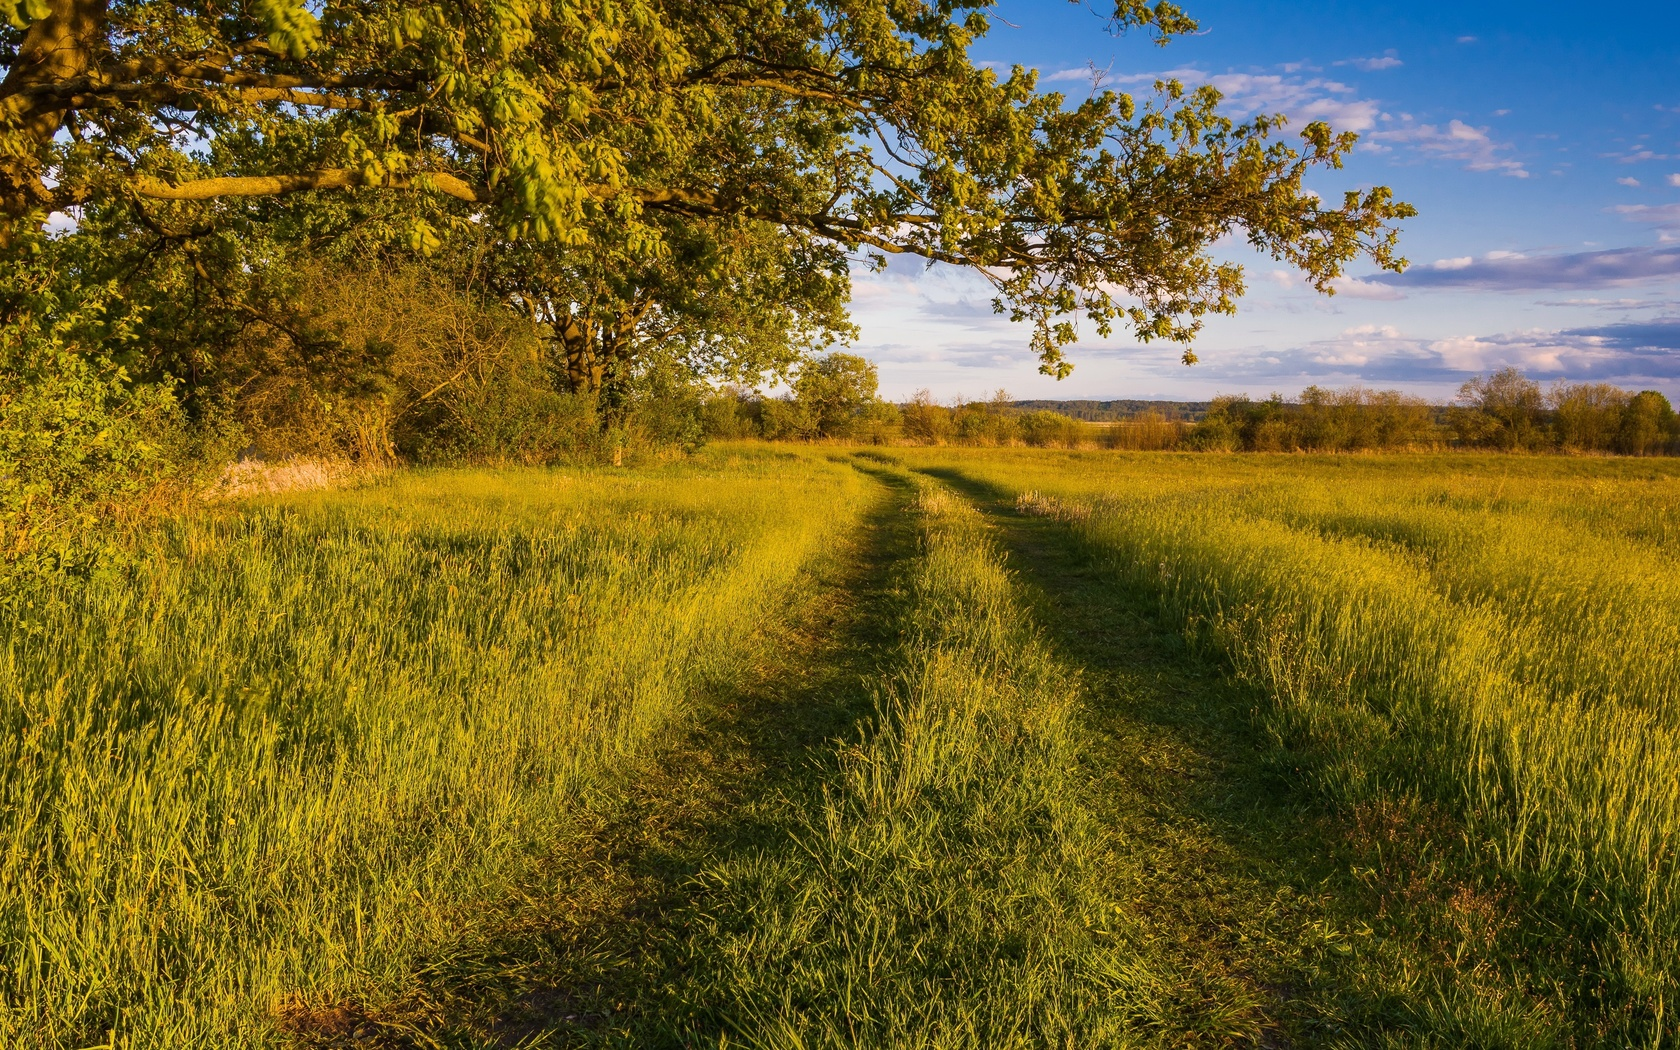 поле, лето, ветки, трава, природа